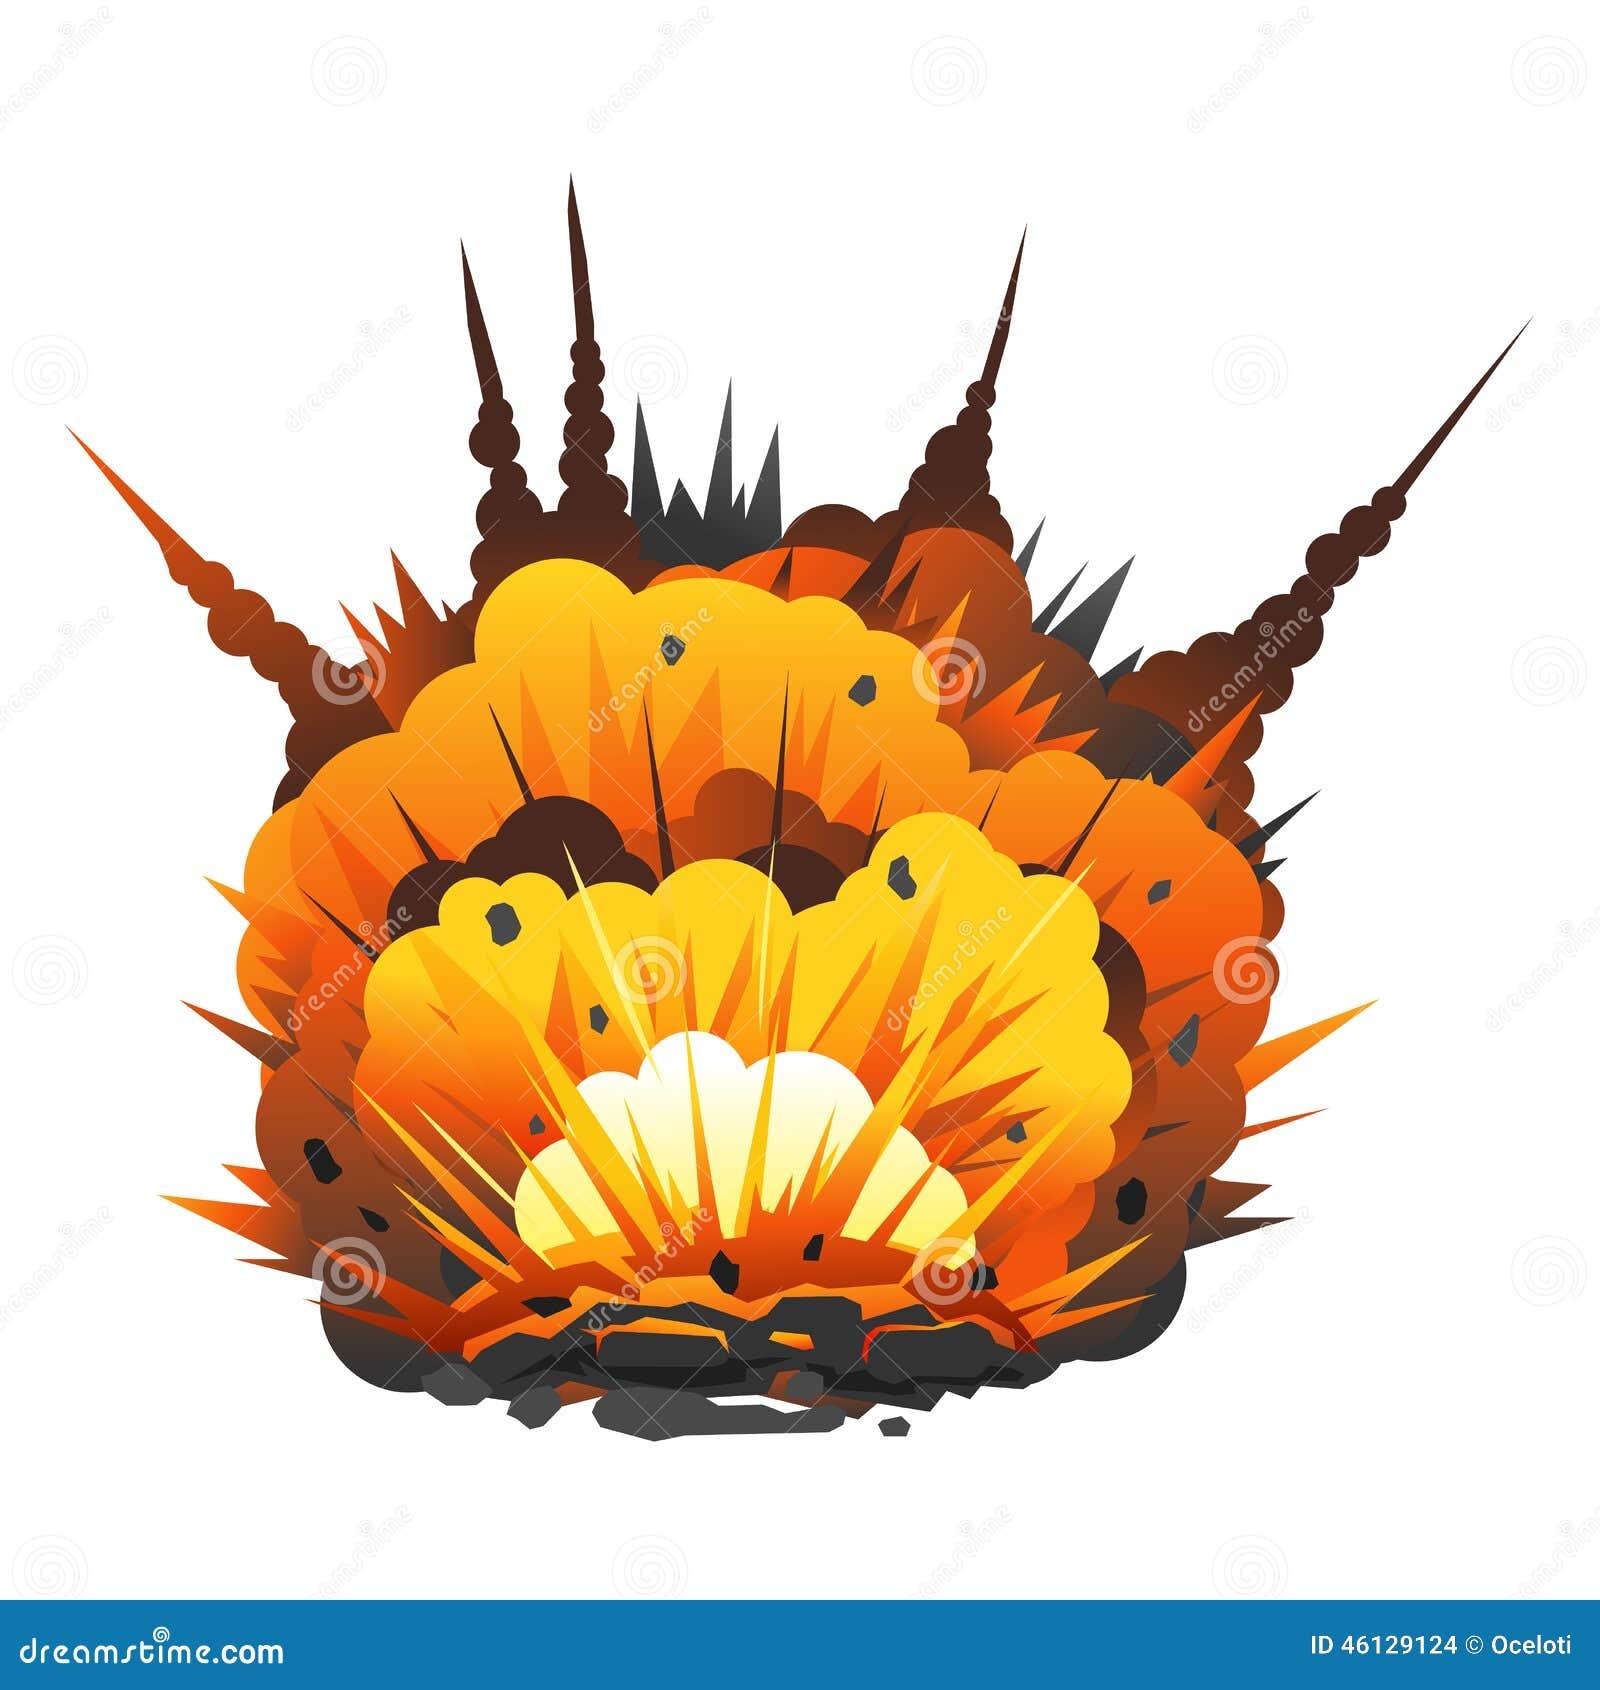 big cartoon bomb explosion stock vector illustration of frame clip art free download frame clip art free for memorial board